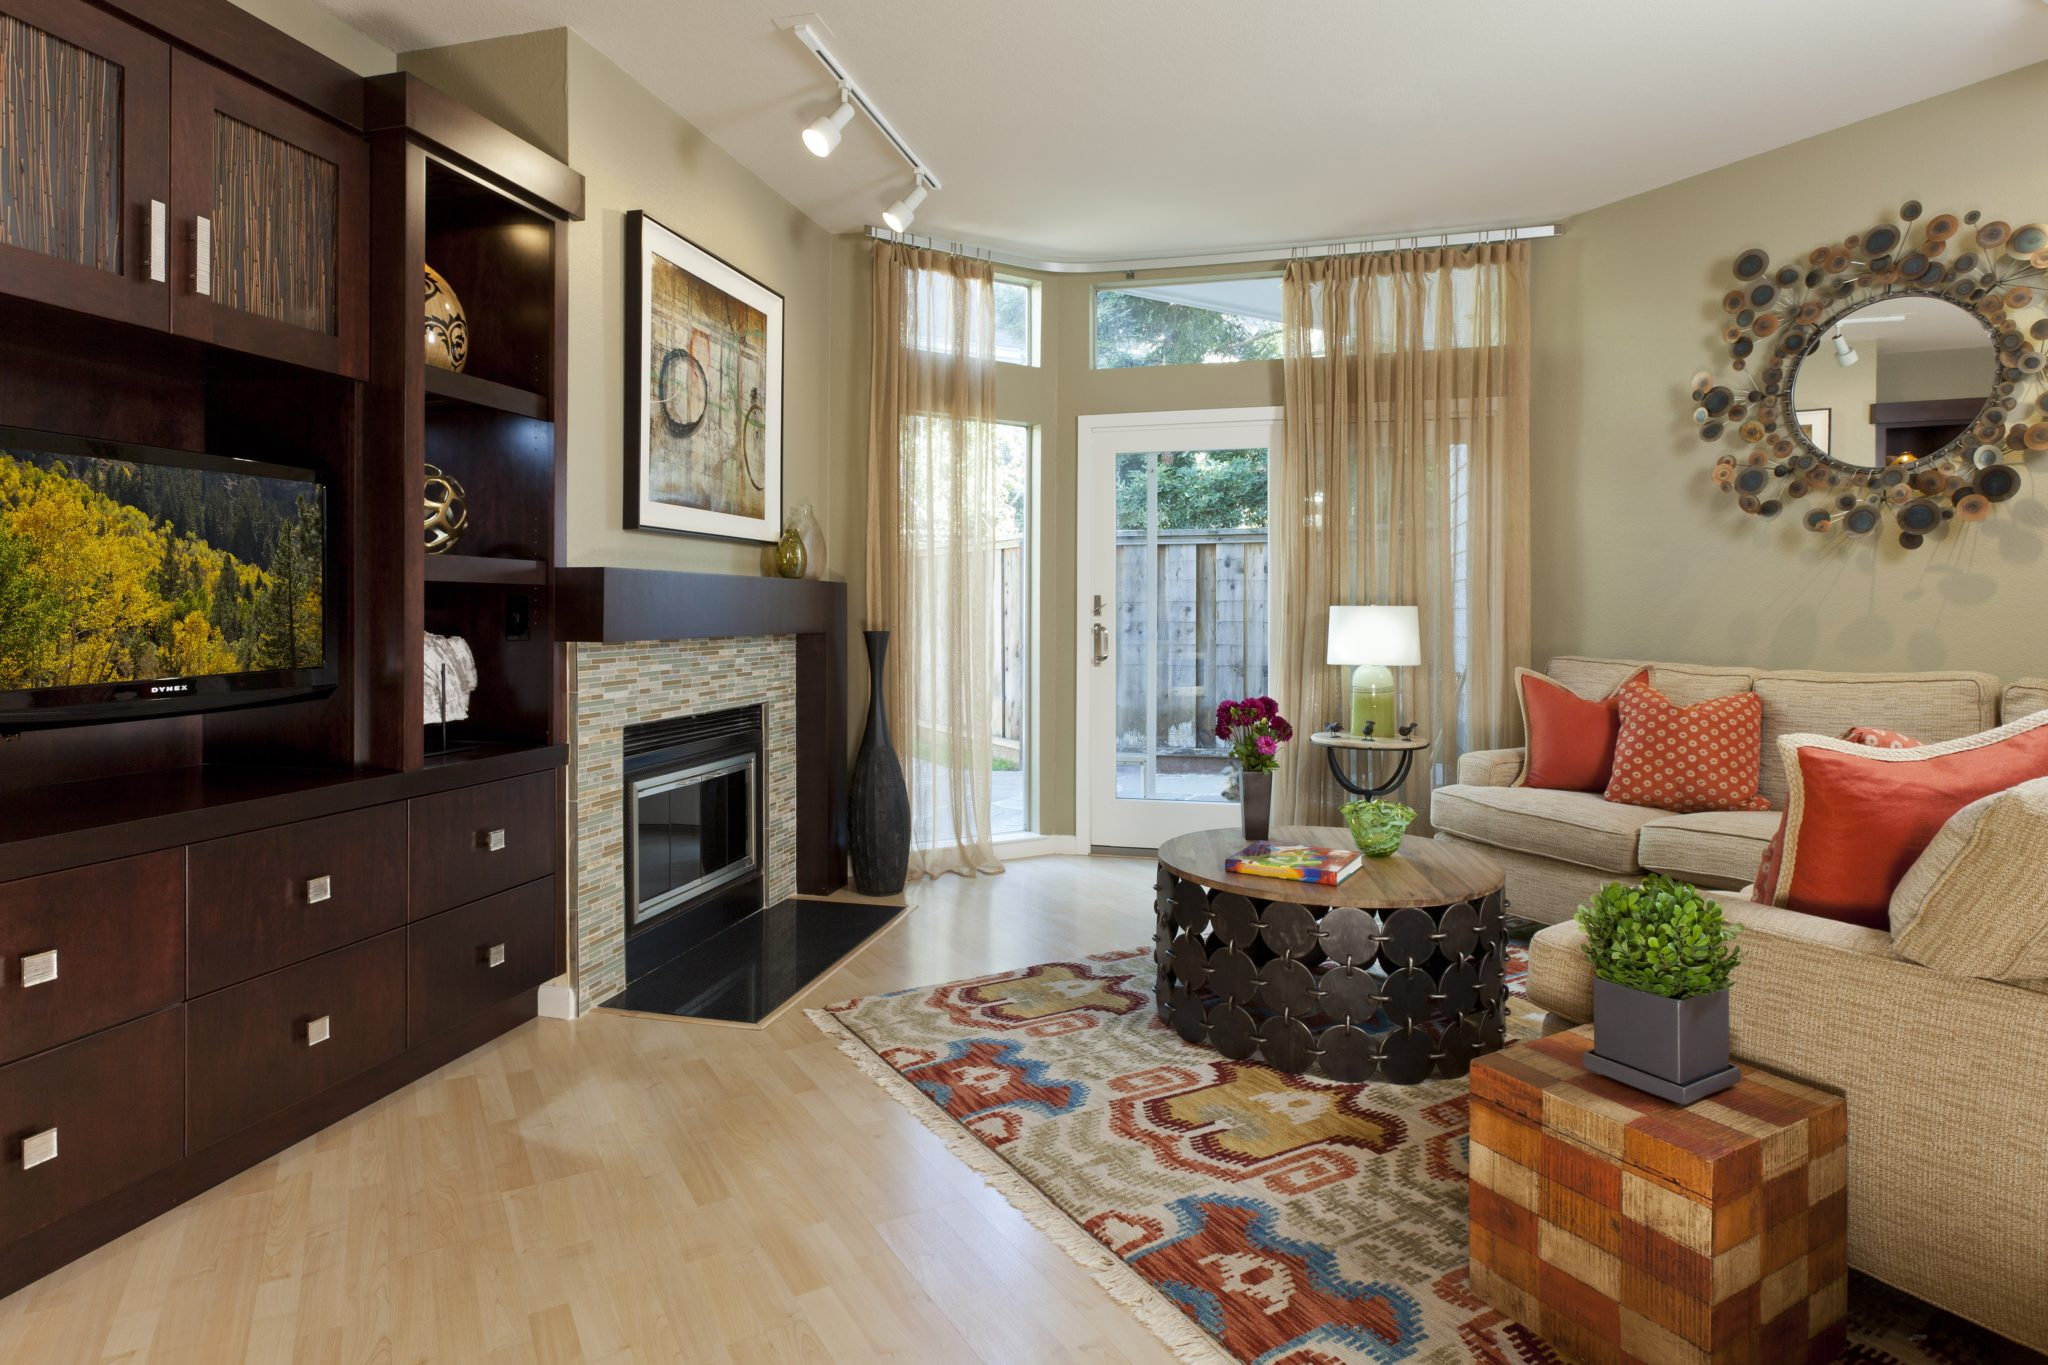 Interior design by Alison Whittaker Design